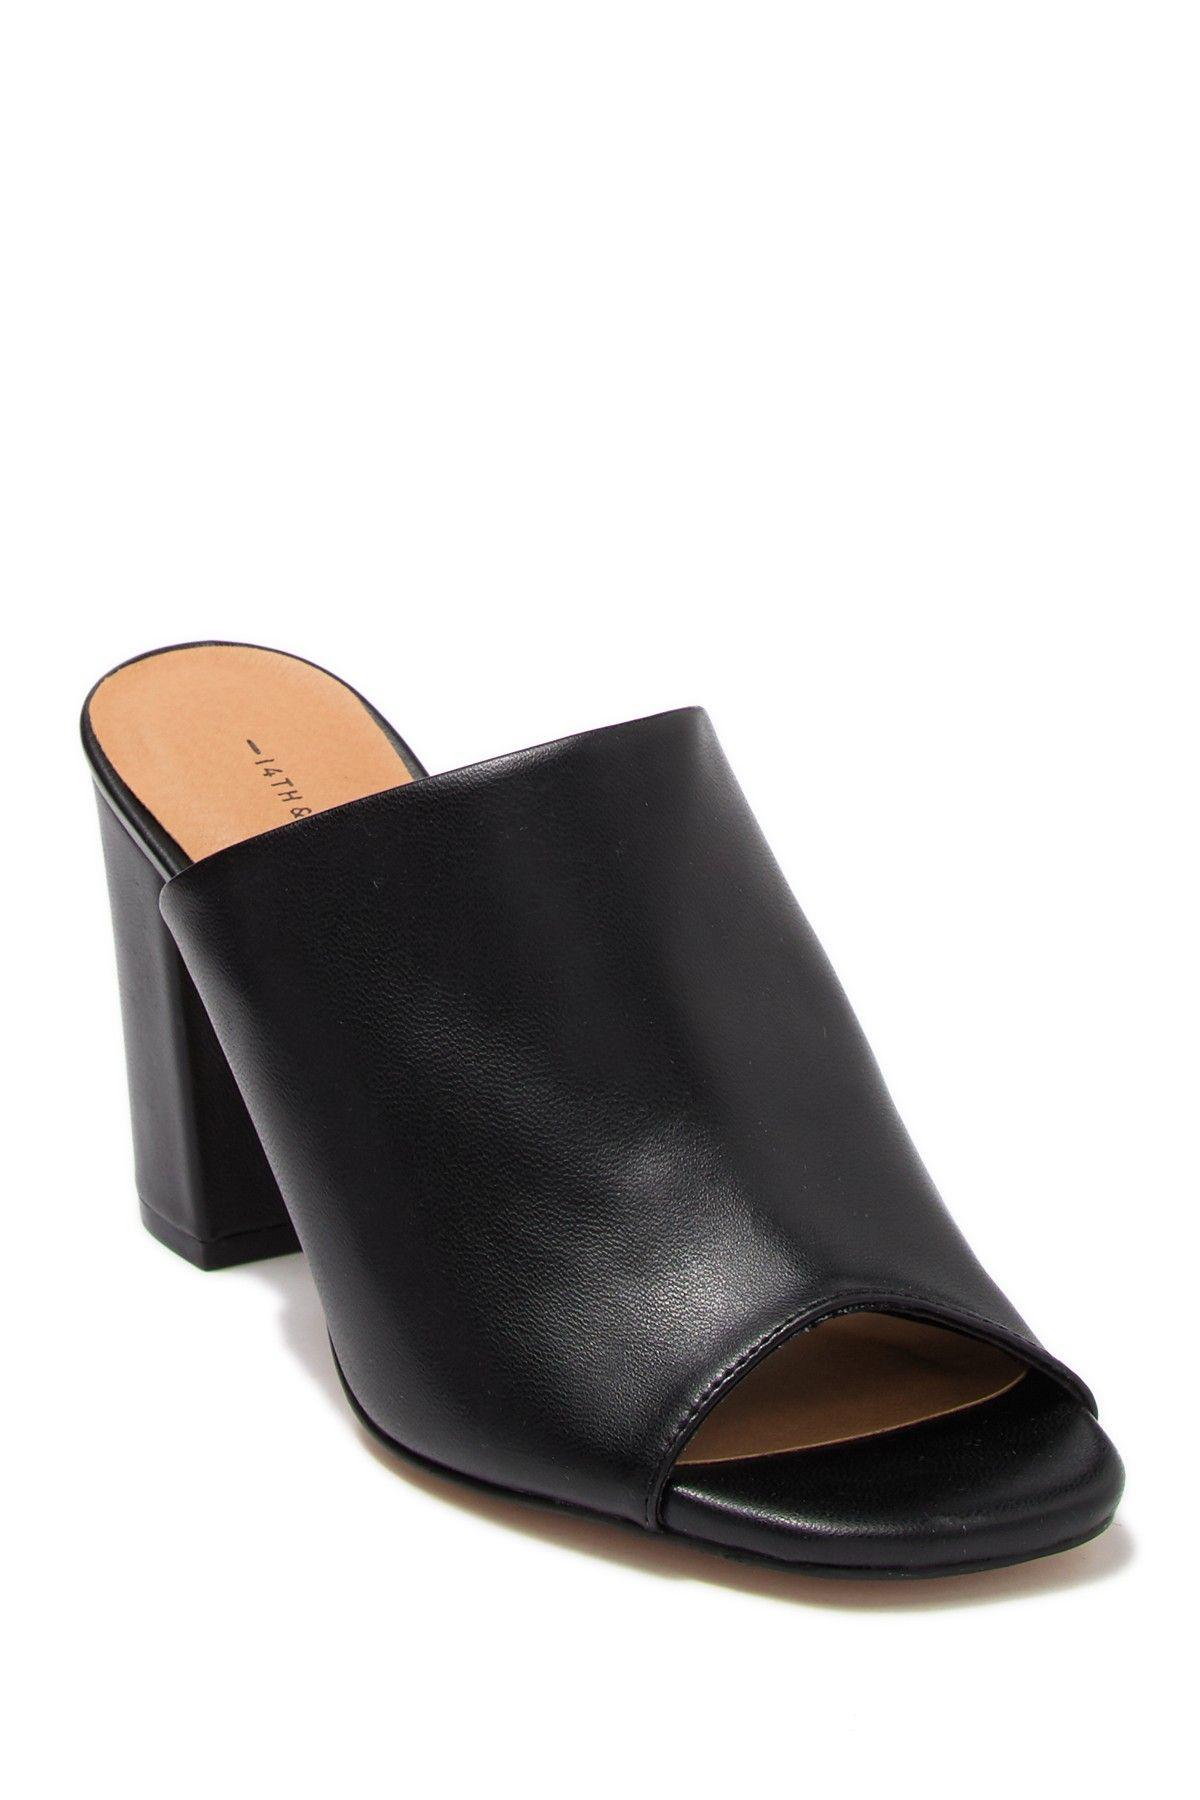 Details about  /find Women/'s Block Heel Mule Open-Toe Sandals Heeled